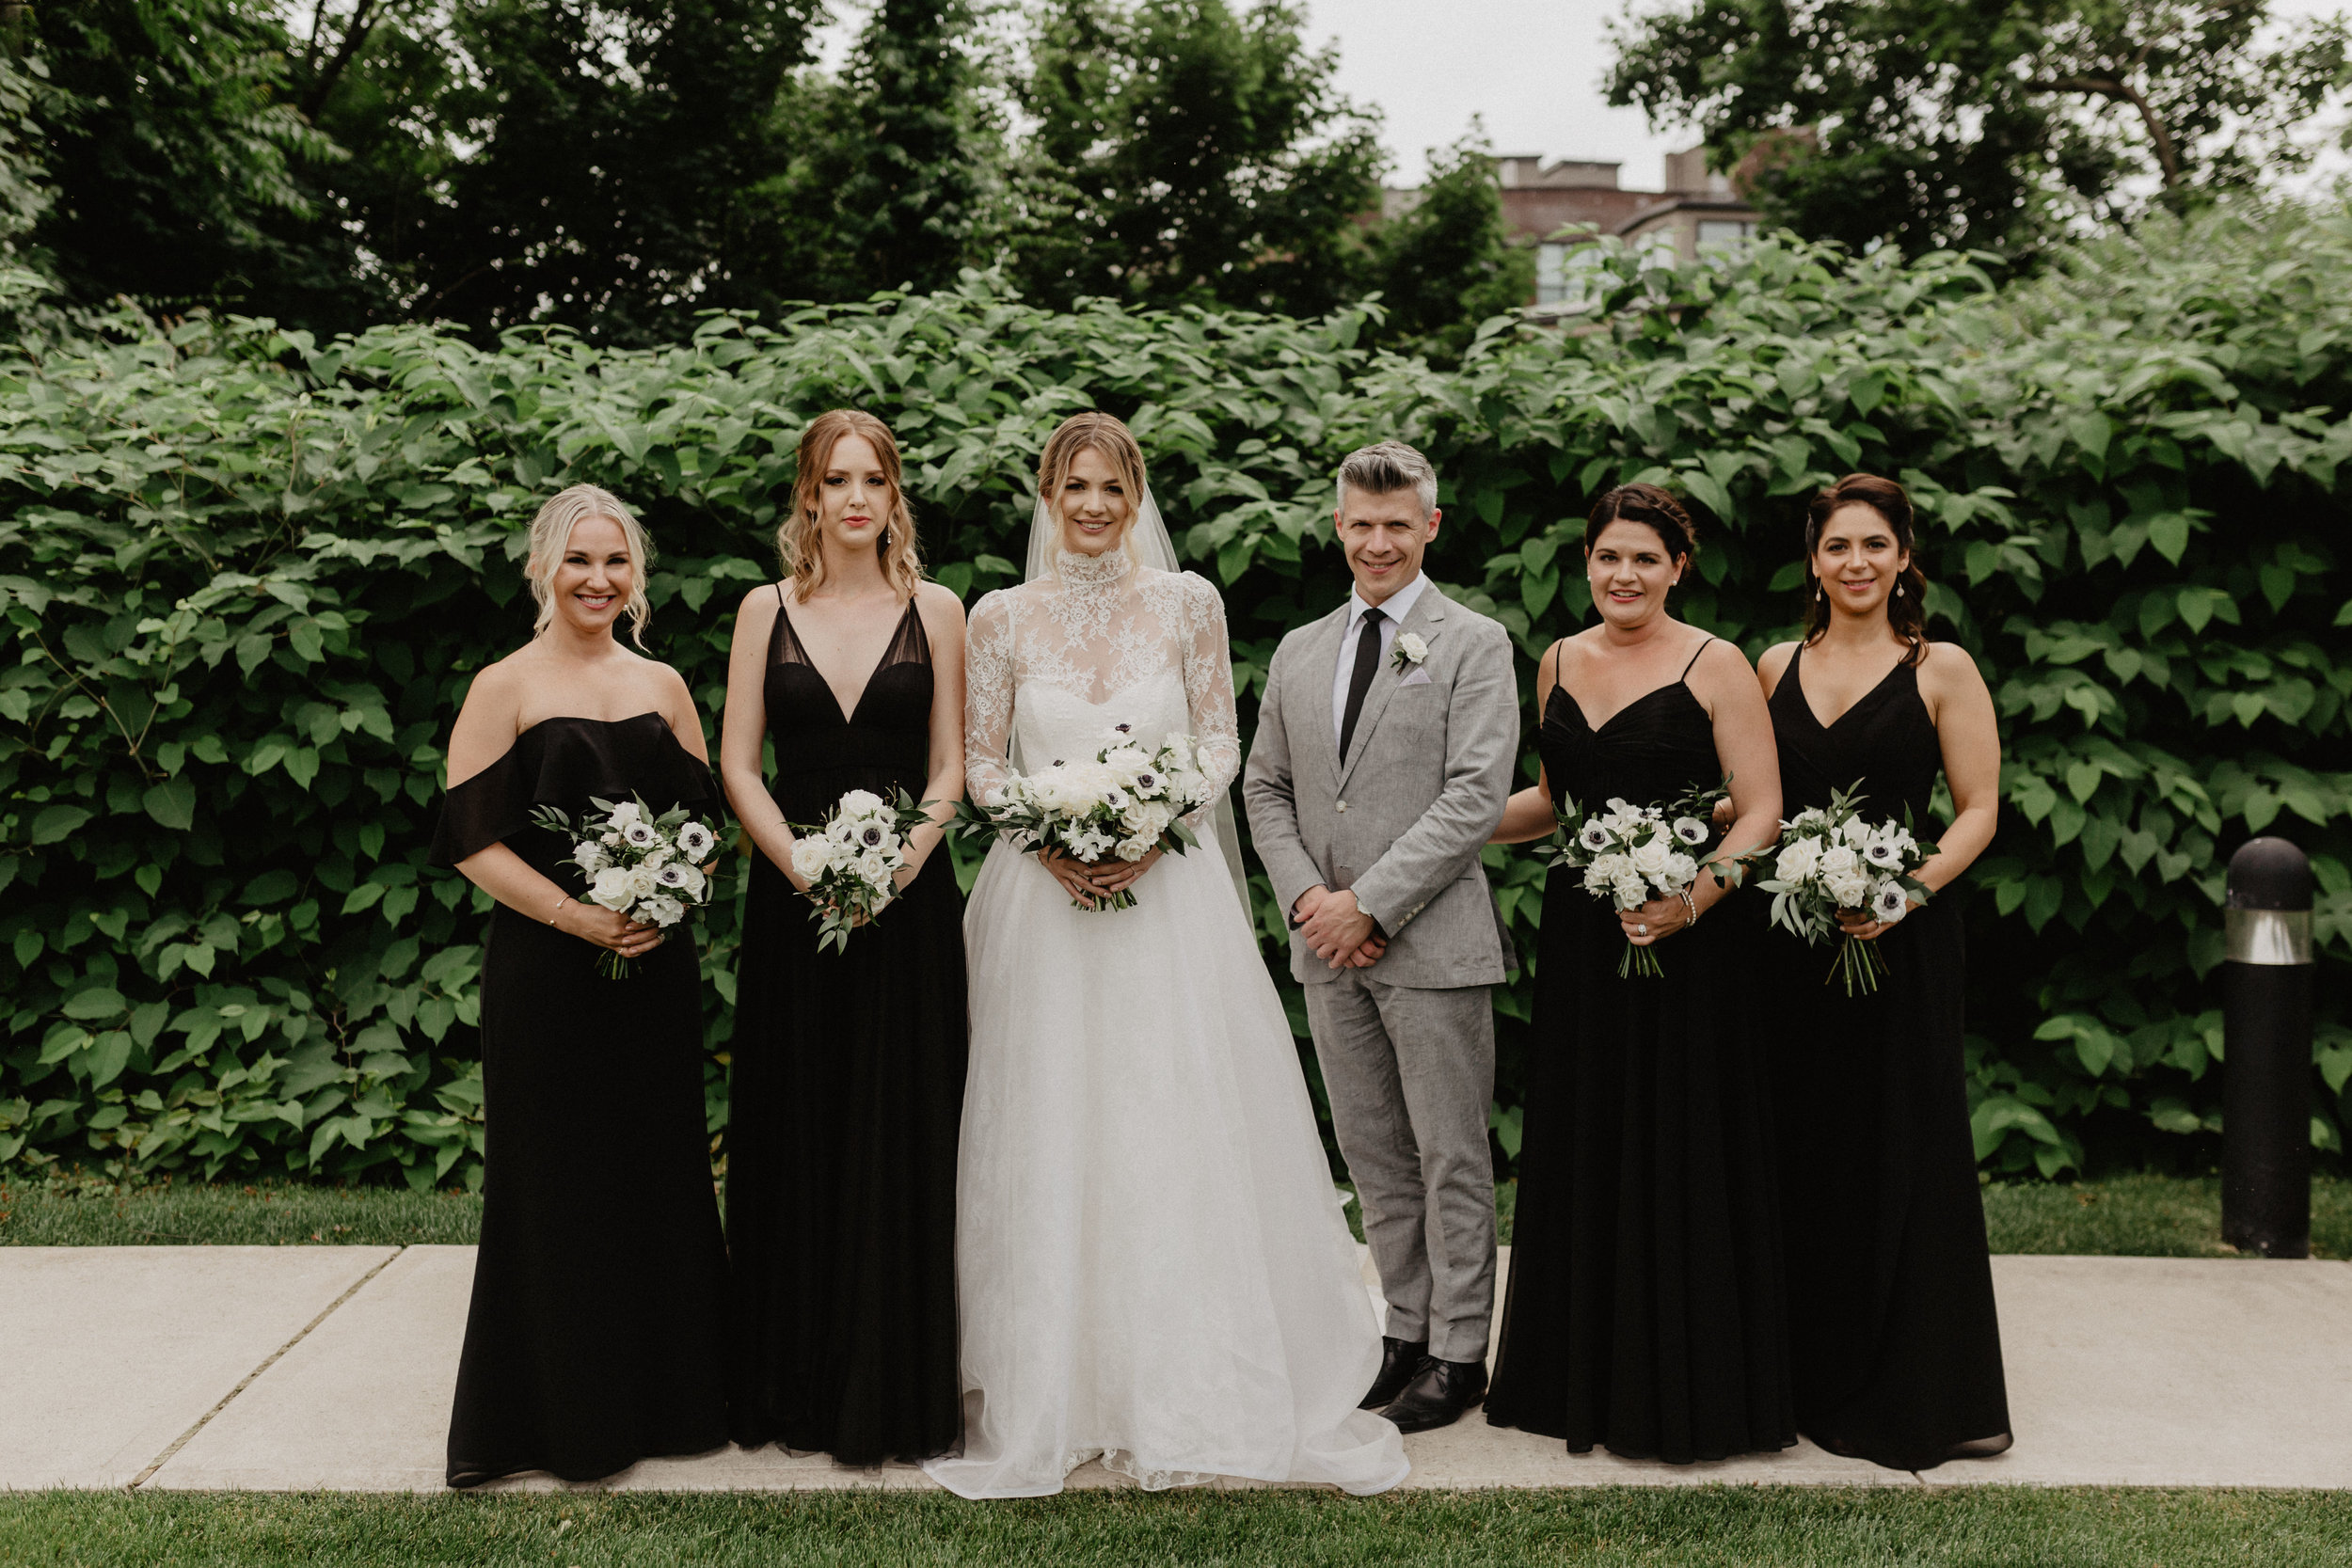 roundhouse-wedding045.jpg